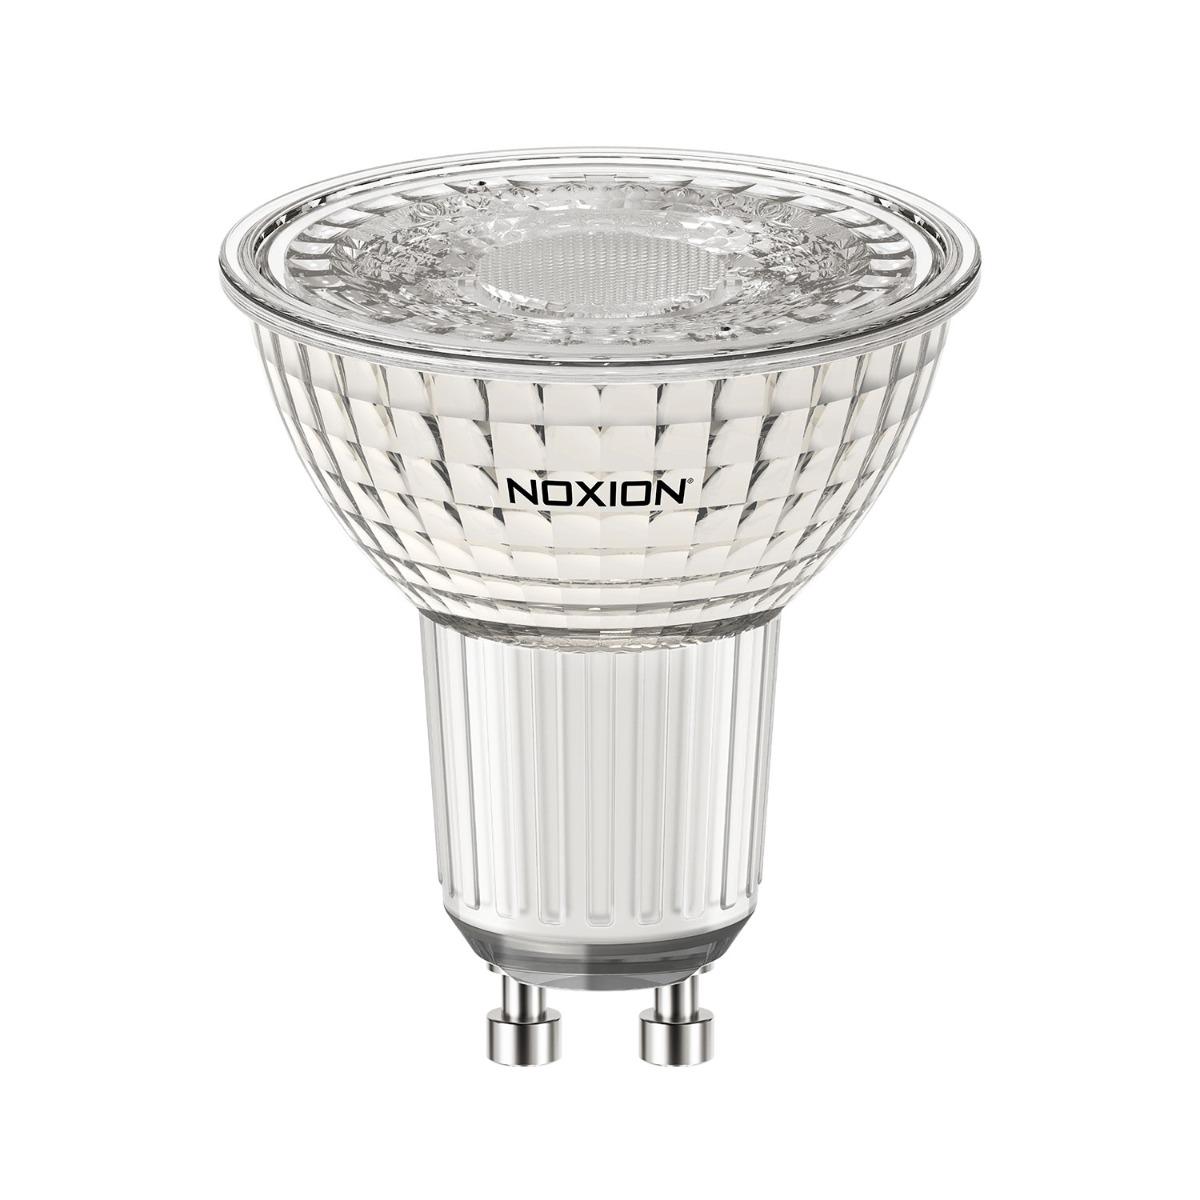 Noxion LED Spot PerfectColor GU10 5.5W 940 60D 480lm | Dimbaar - Koel Wit - Vervangt 50W